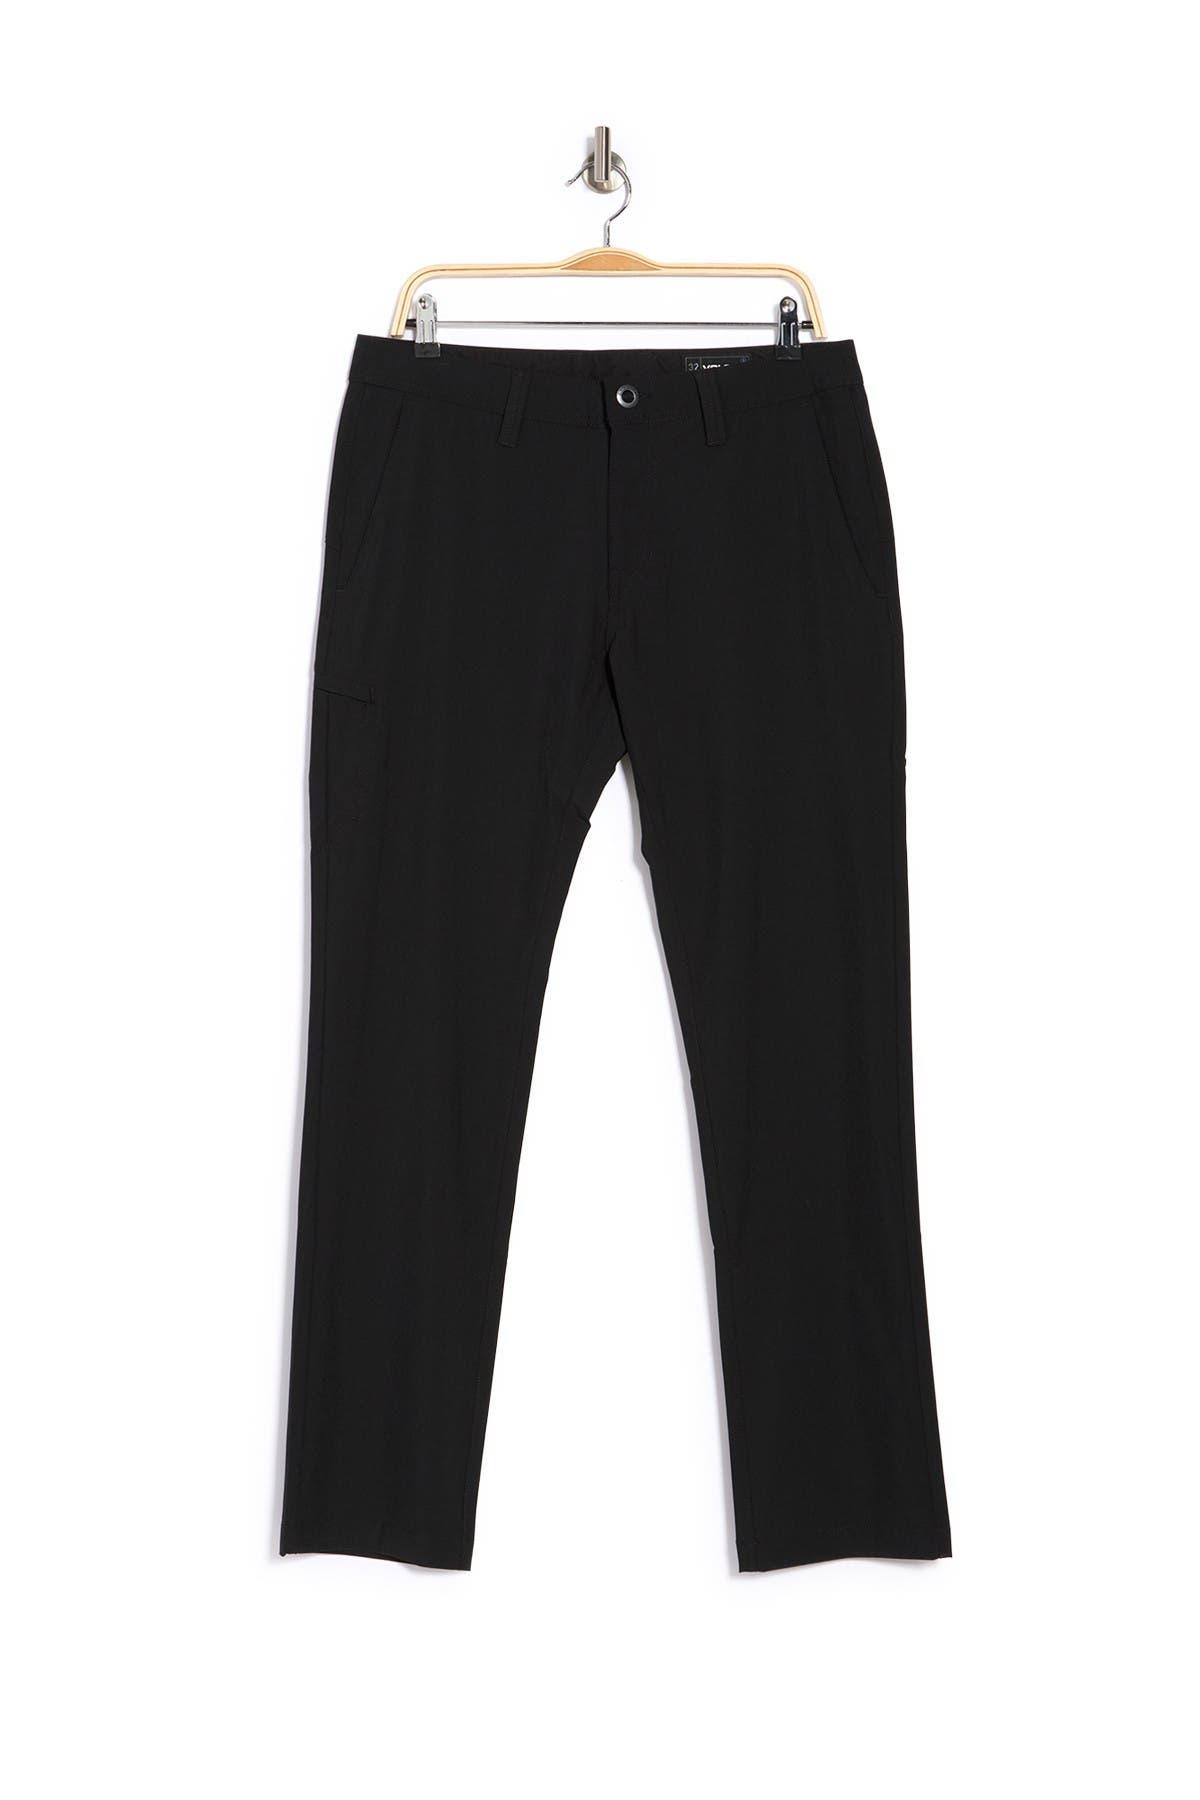 Image of Volcom Range Stretch Pants